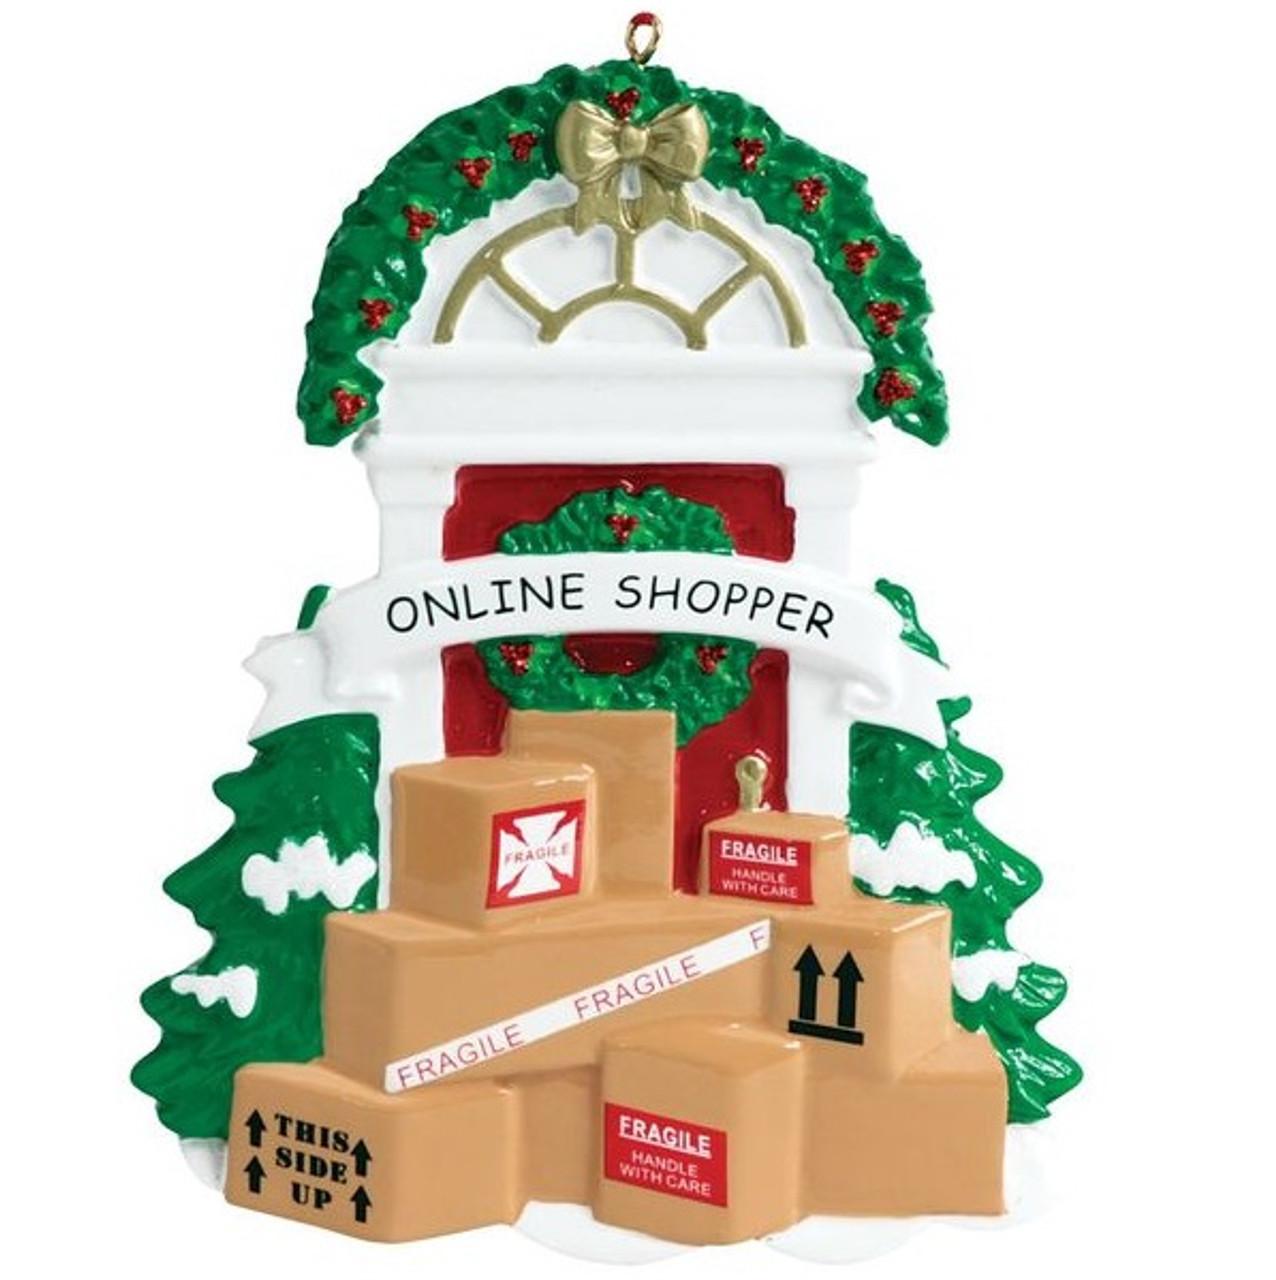 Online Shopper Personalized Ornament